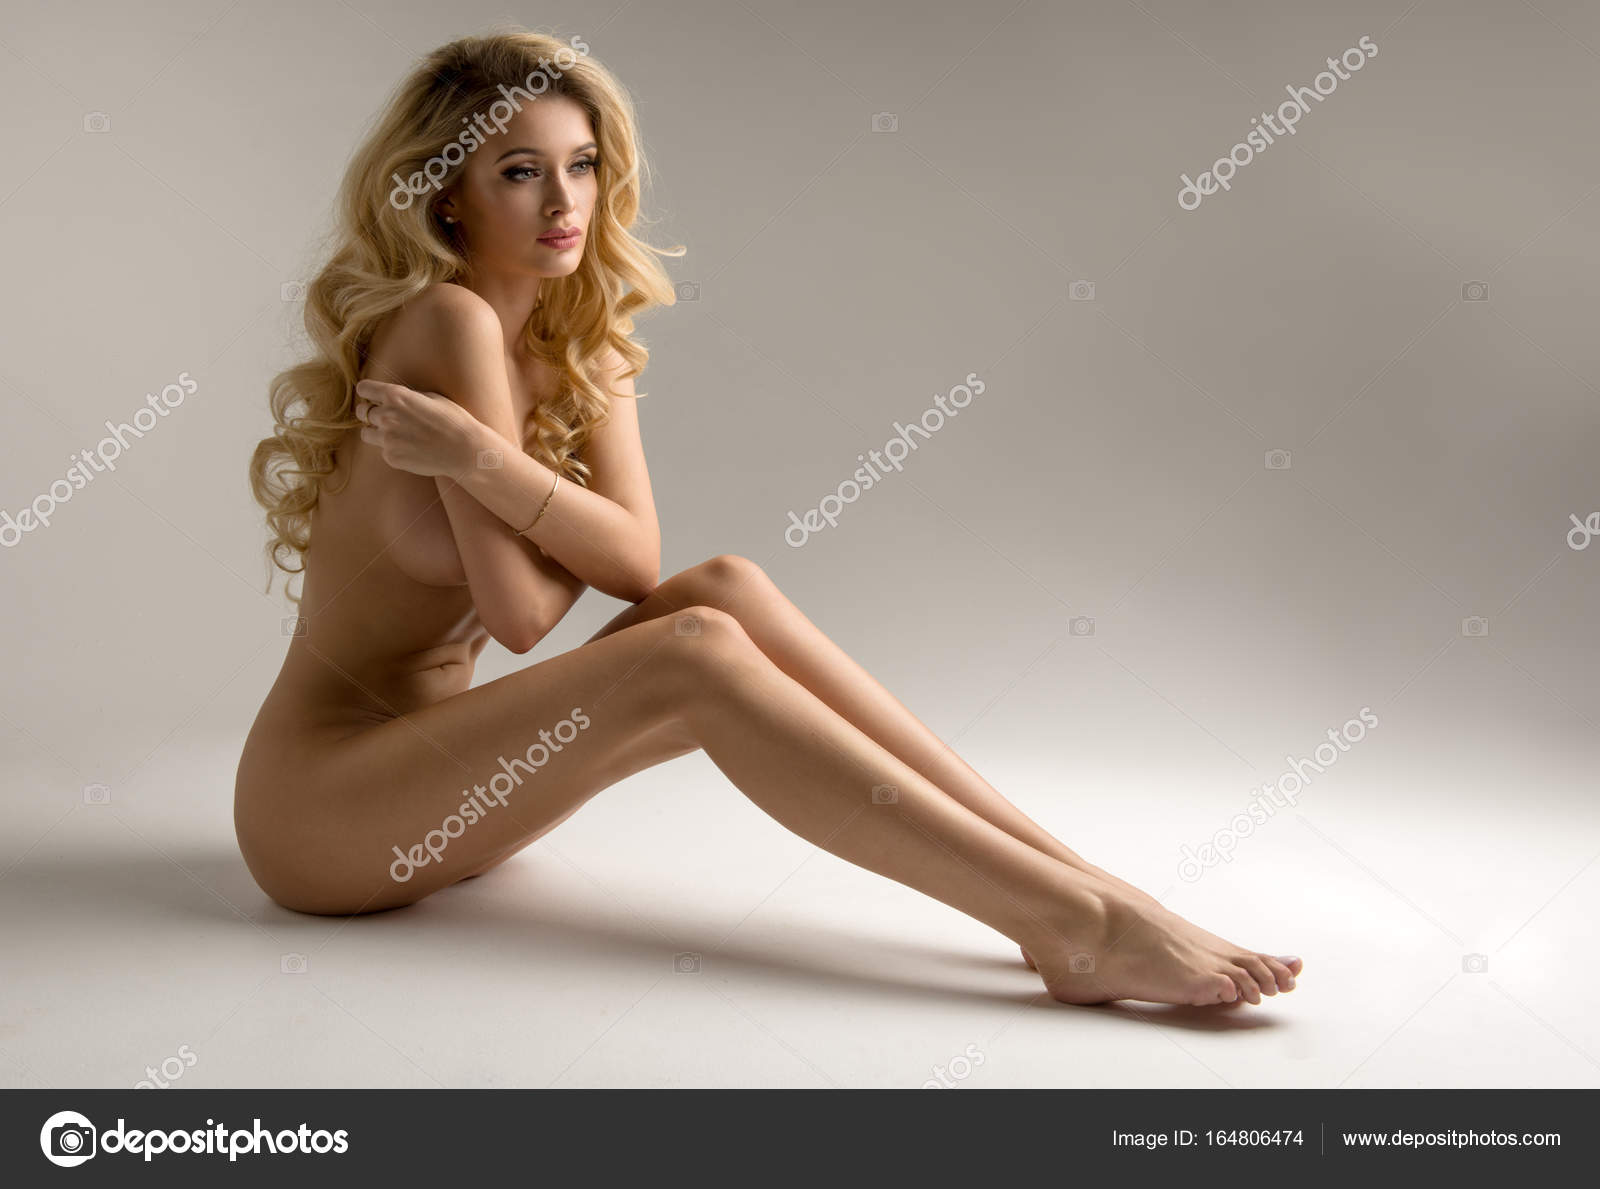 paren-krasivie-golie-blondinki-v-vozraste-porno-blondinka